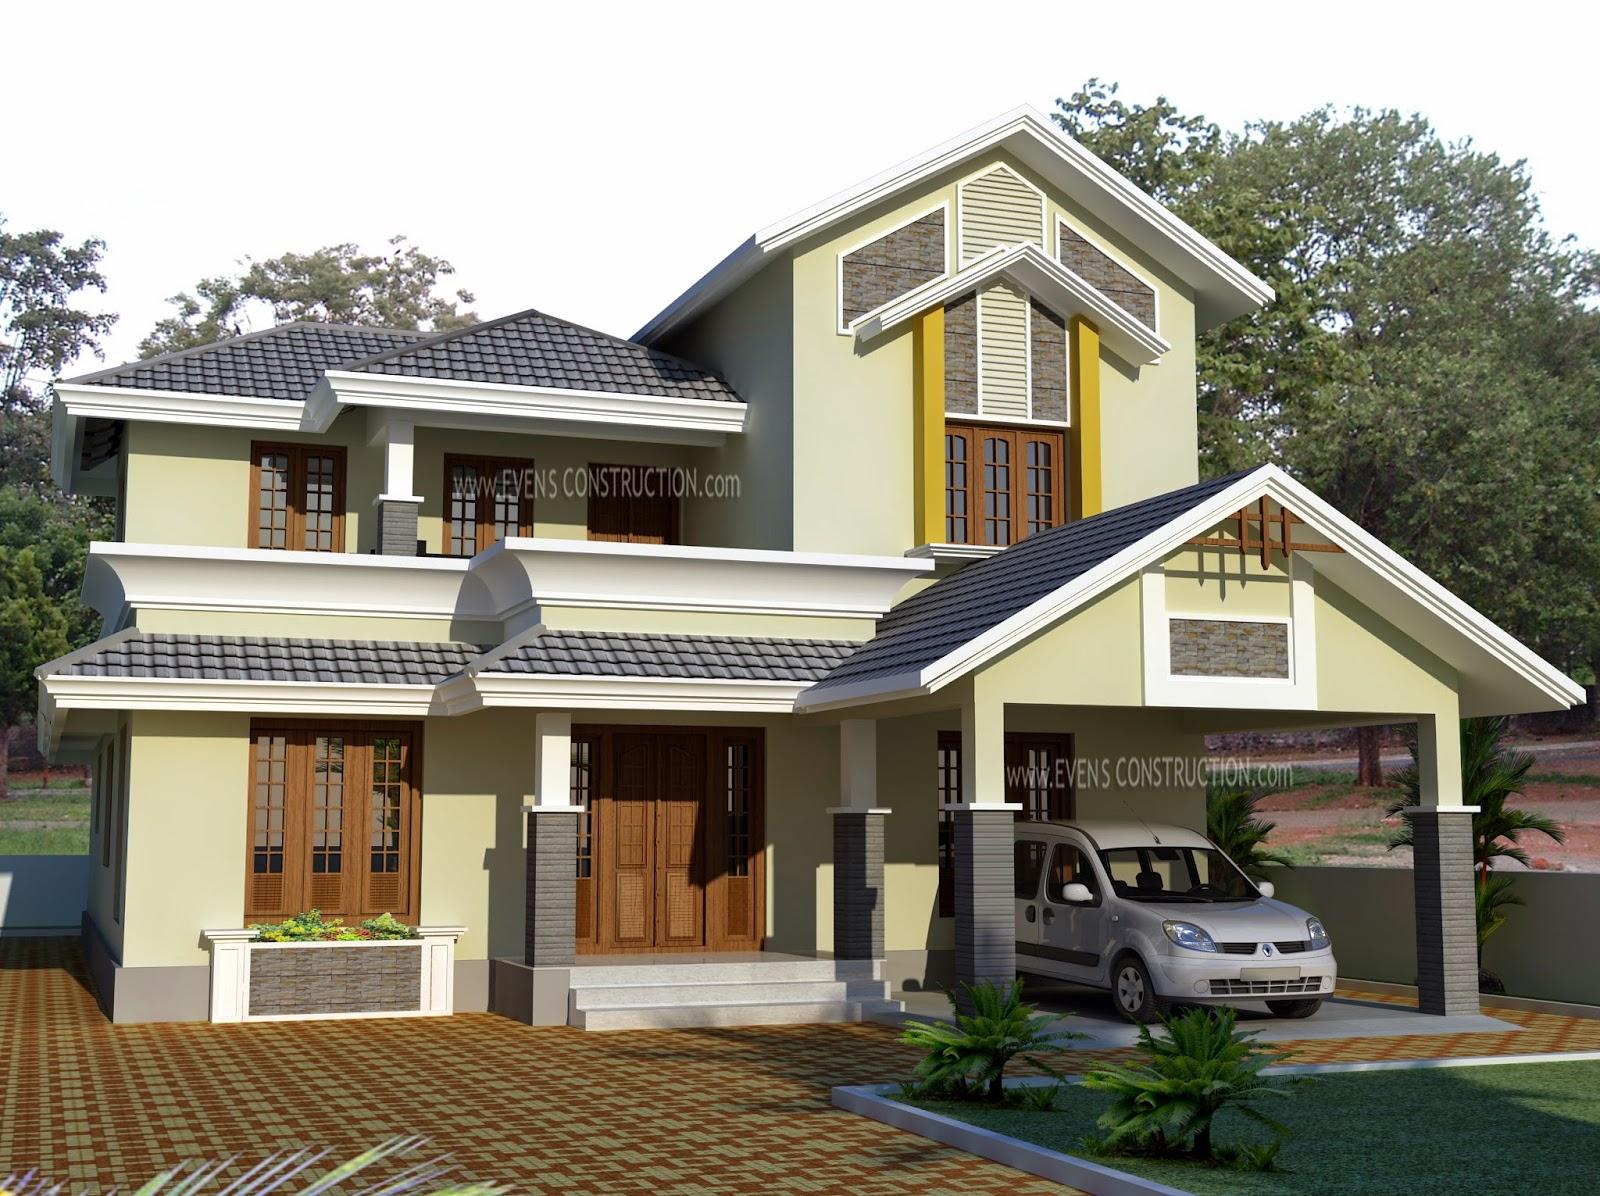 Evens Construction Pvt Ltd Nice 4 Bedroom House In 2476